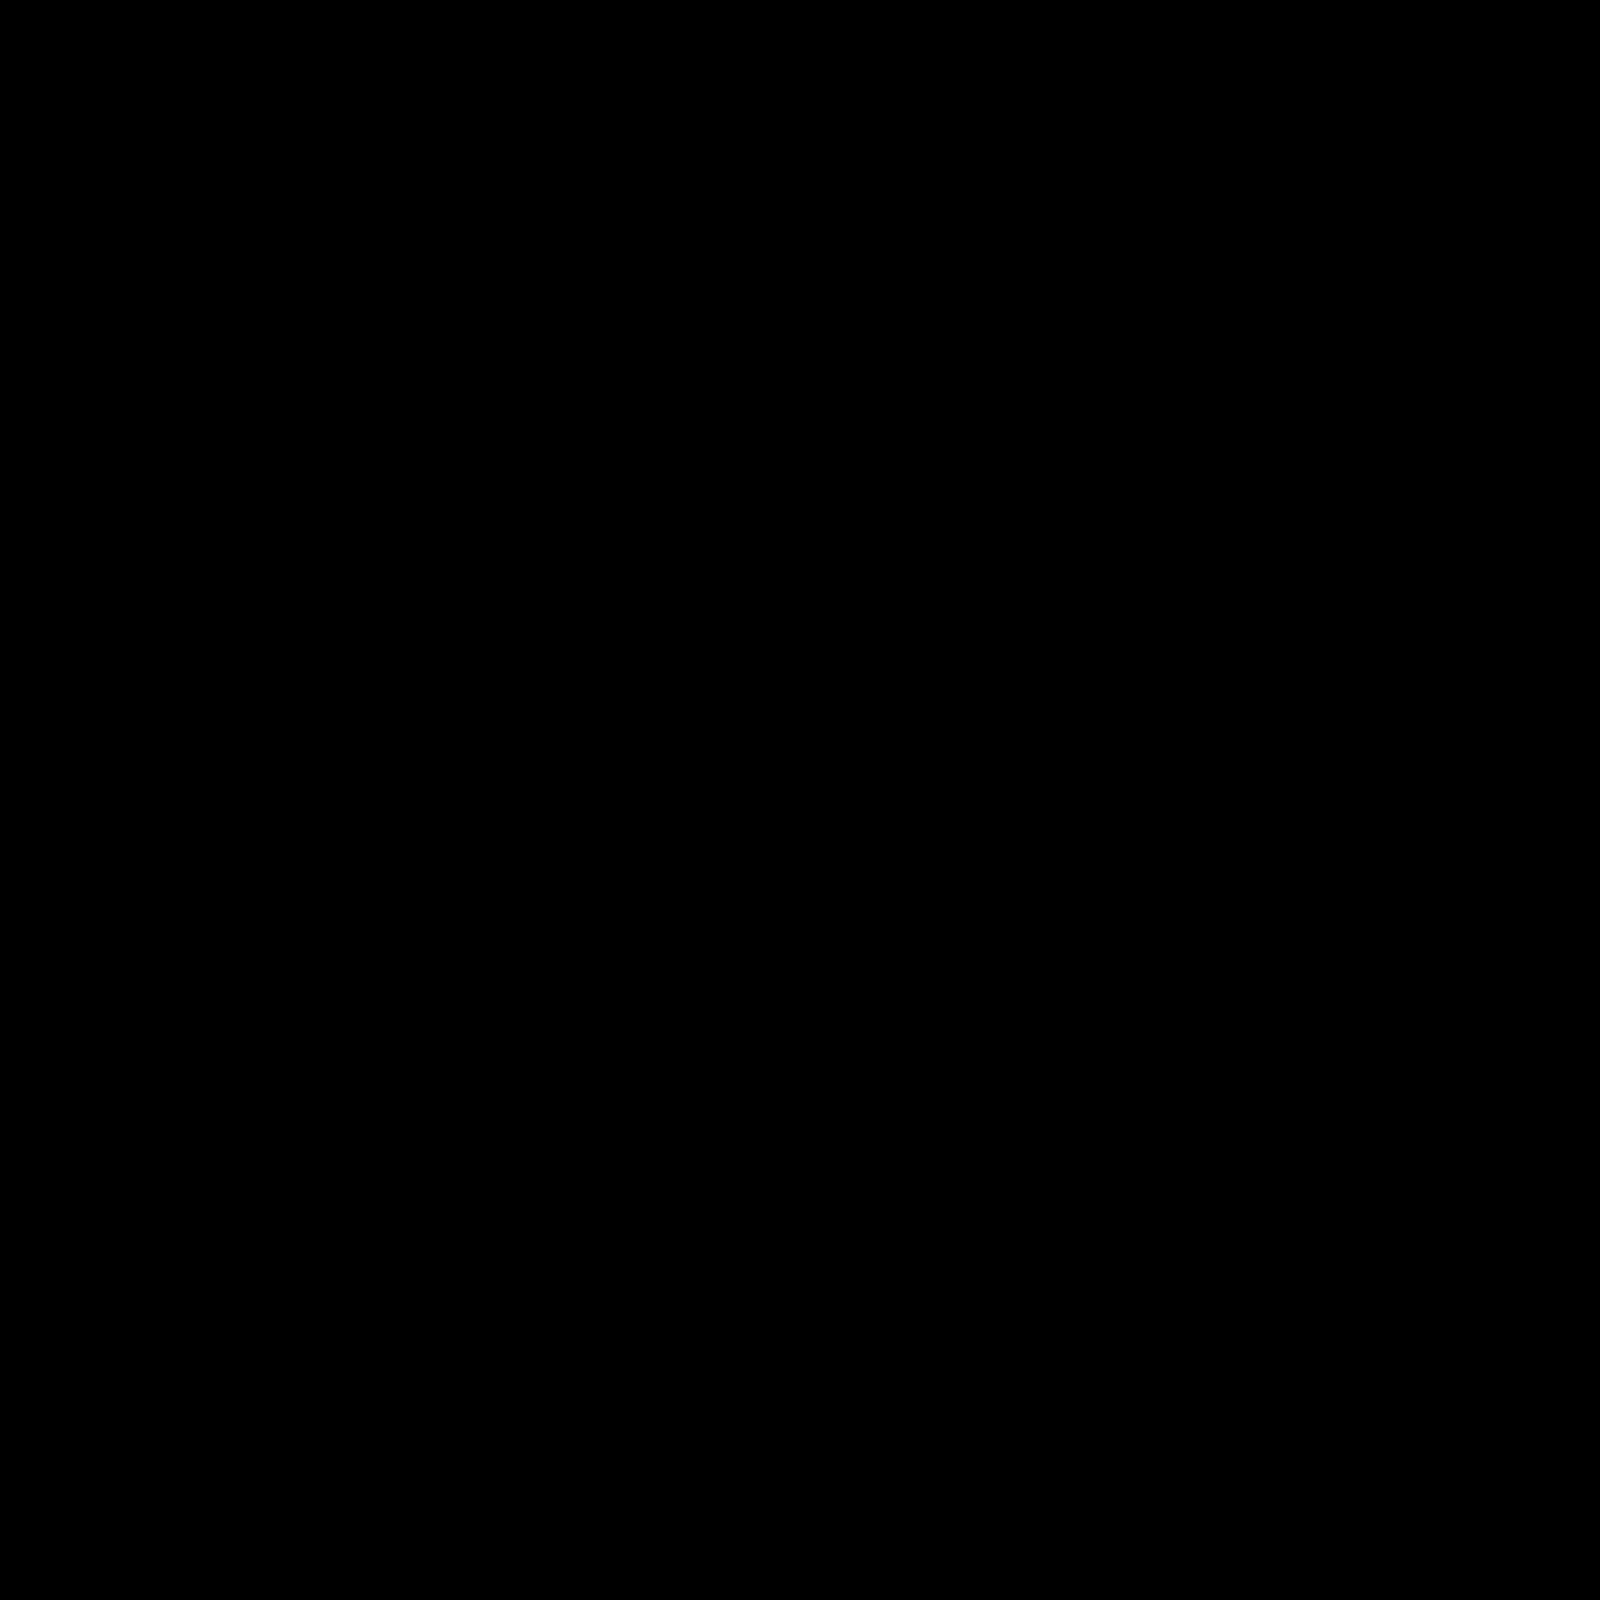 2009 icon